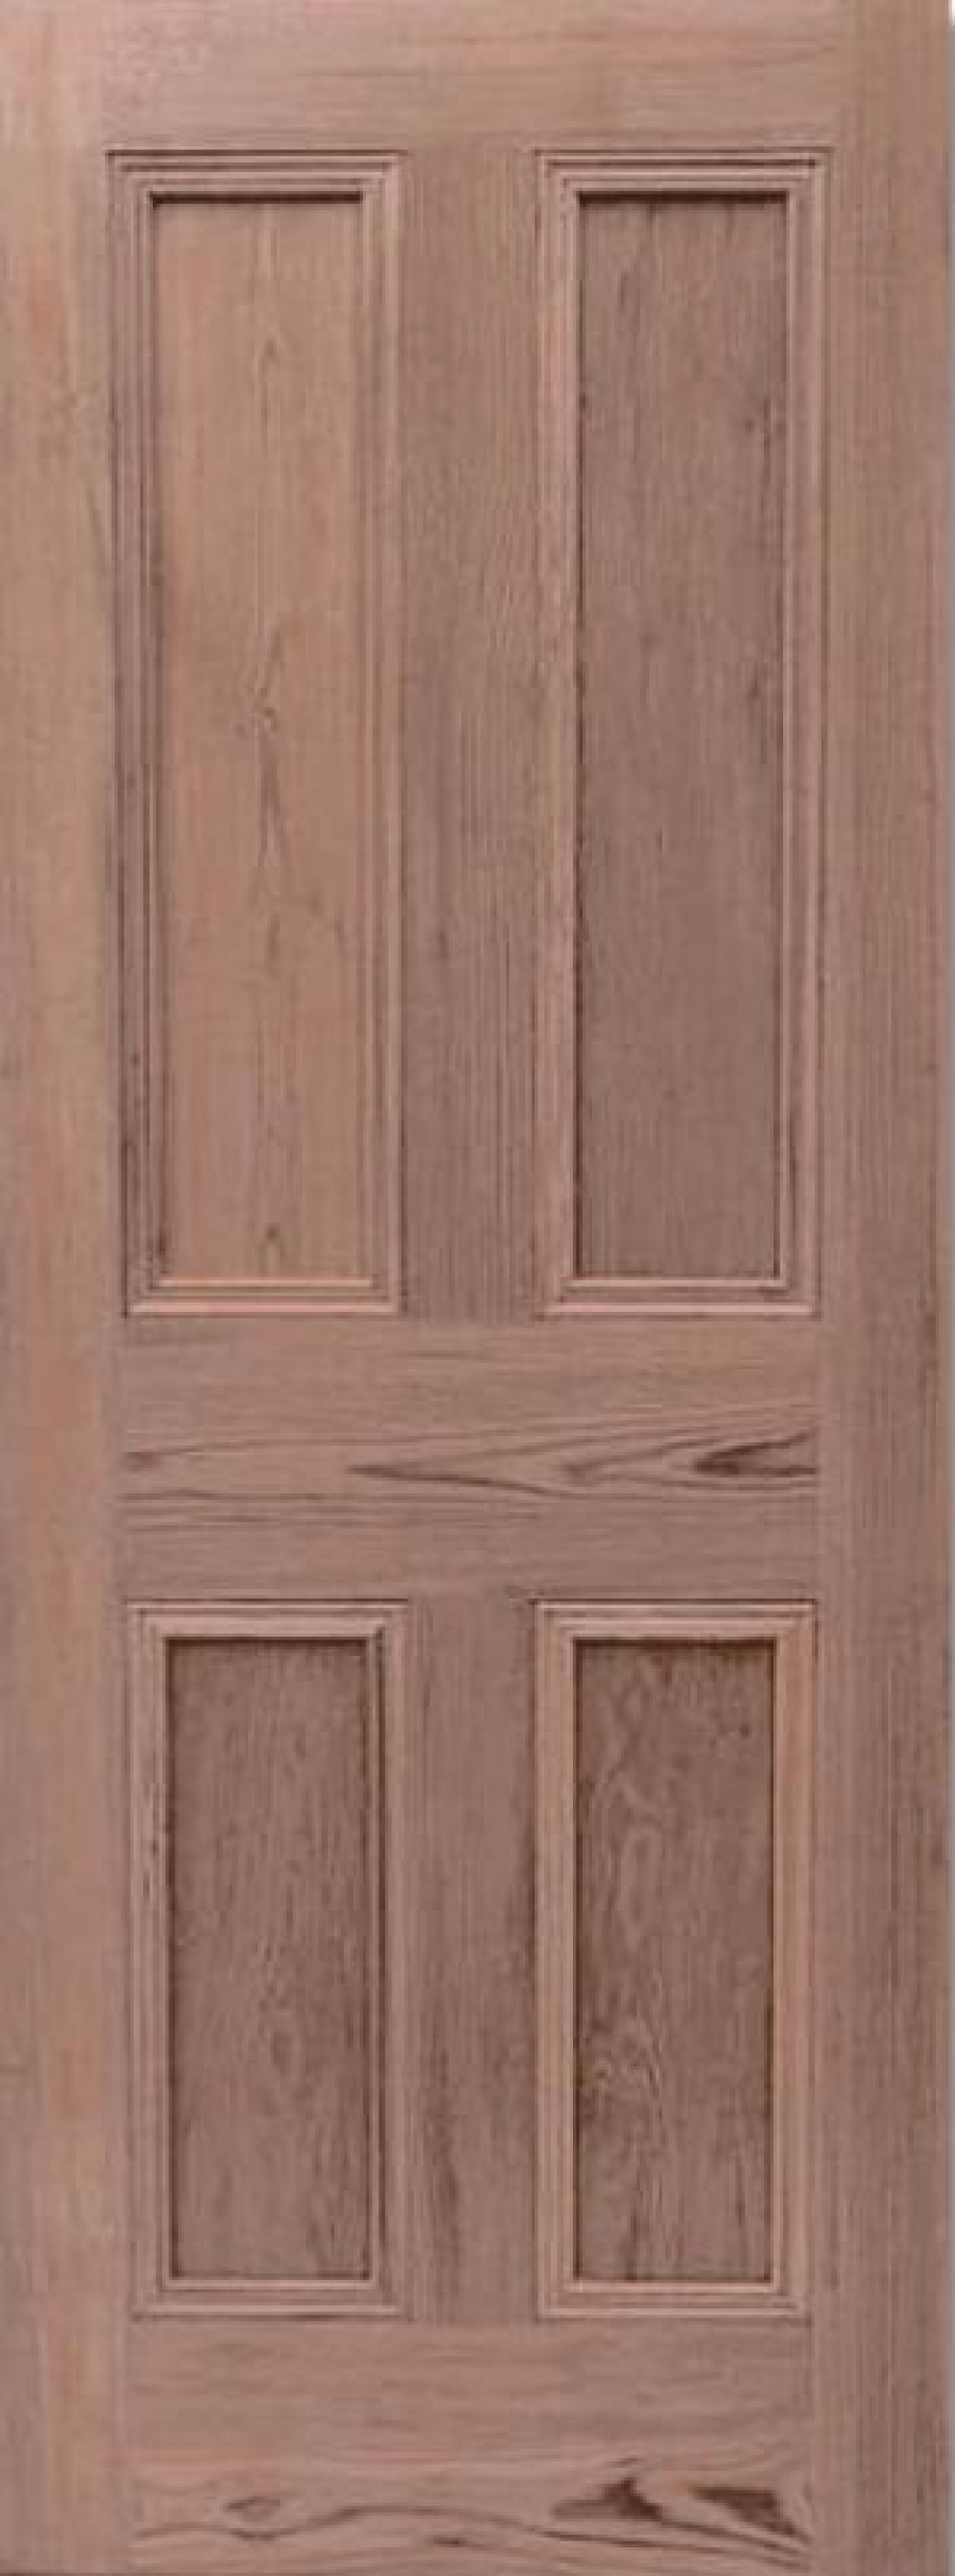 Pitch pine interior doors lpd nostalgia pitch pine 4 for Yellow pine wood doors